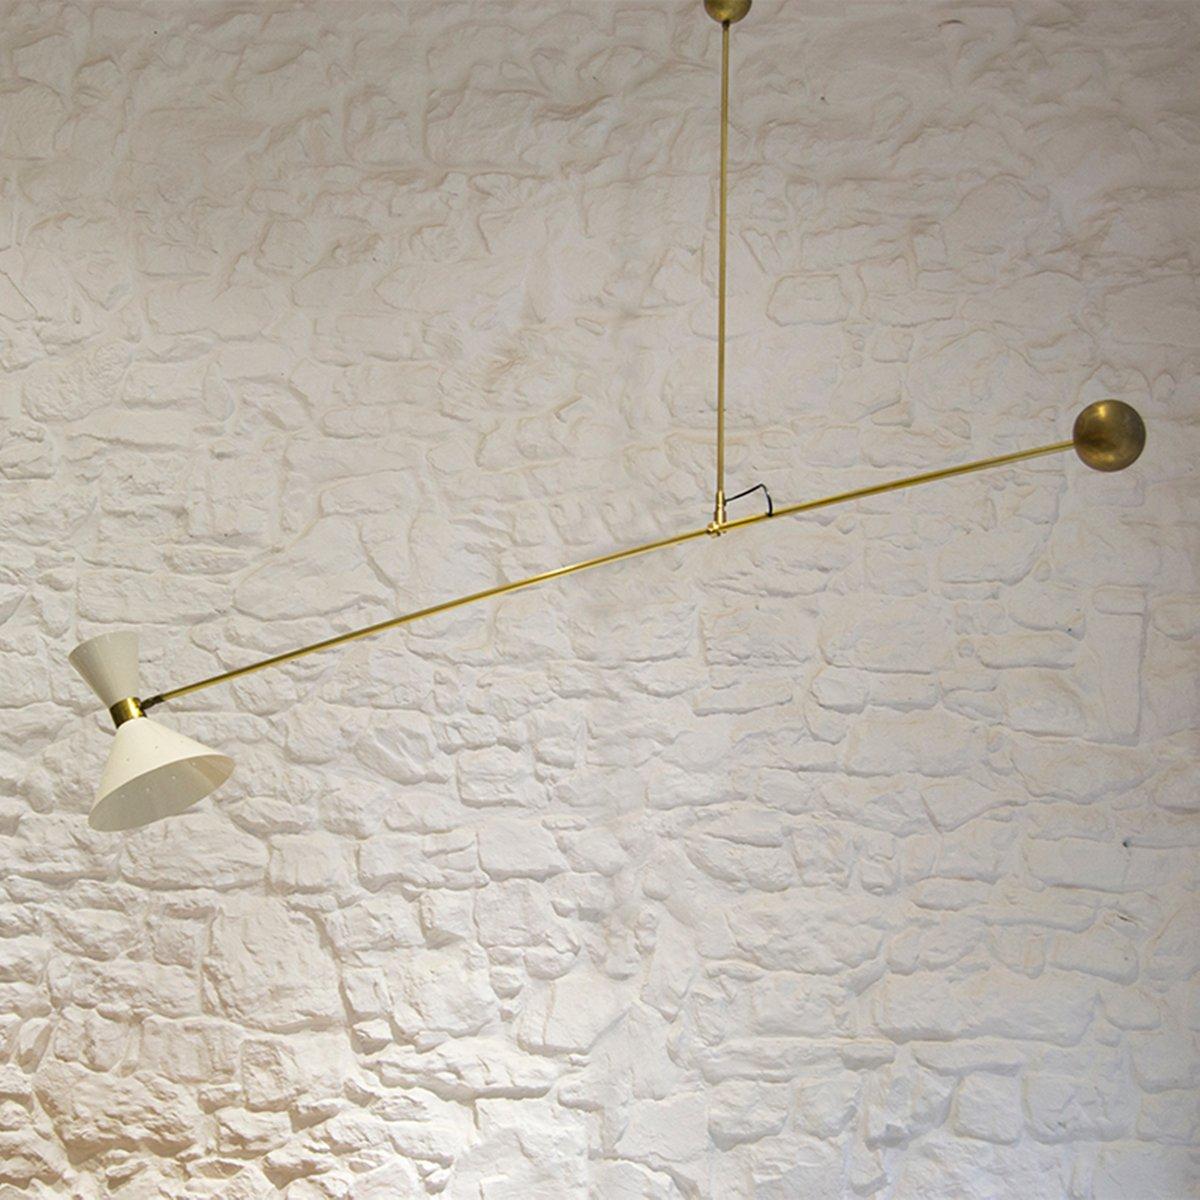 Gegengewicht Lampe, 1960er